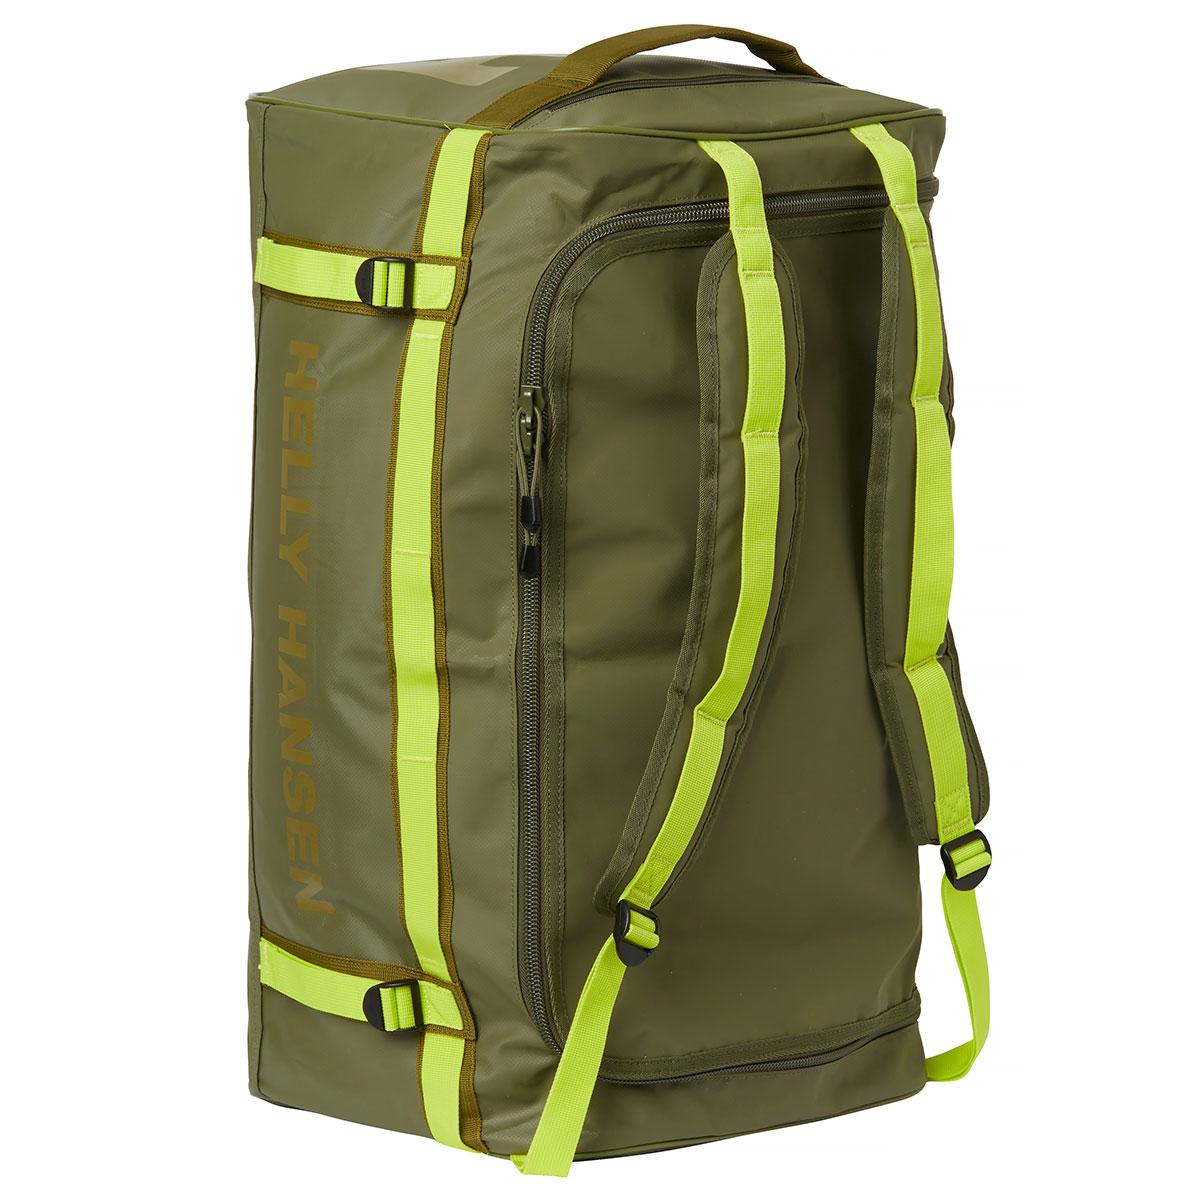 Helly Hansen 2019 HH New Classic Duffel Bag Waterproof Holdall 70L ... bea48f26e7297